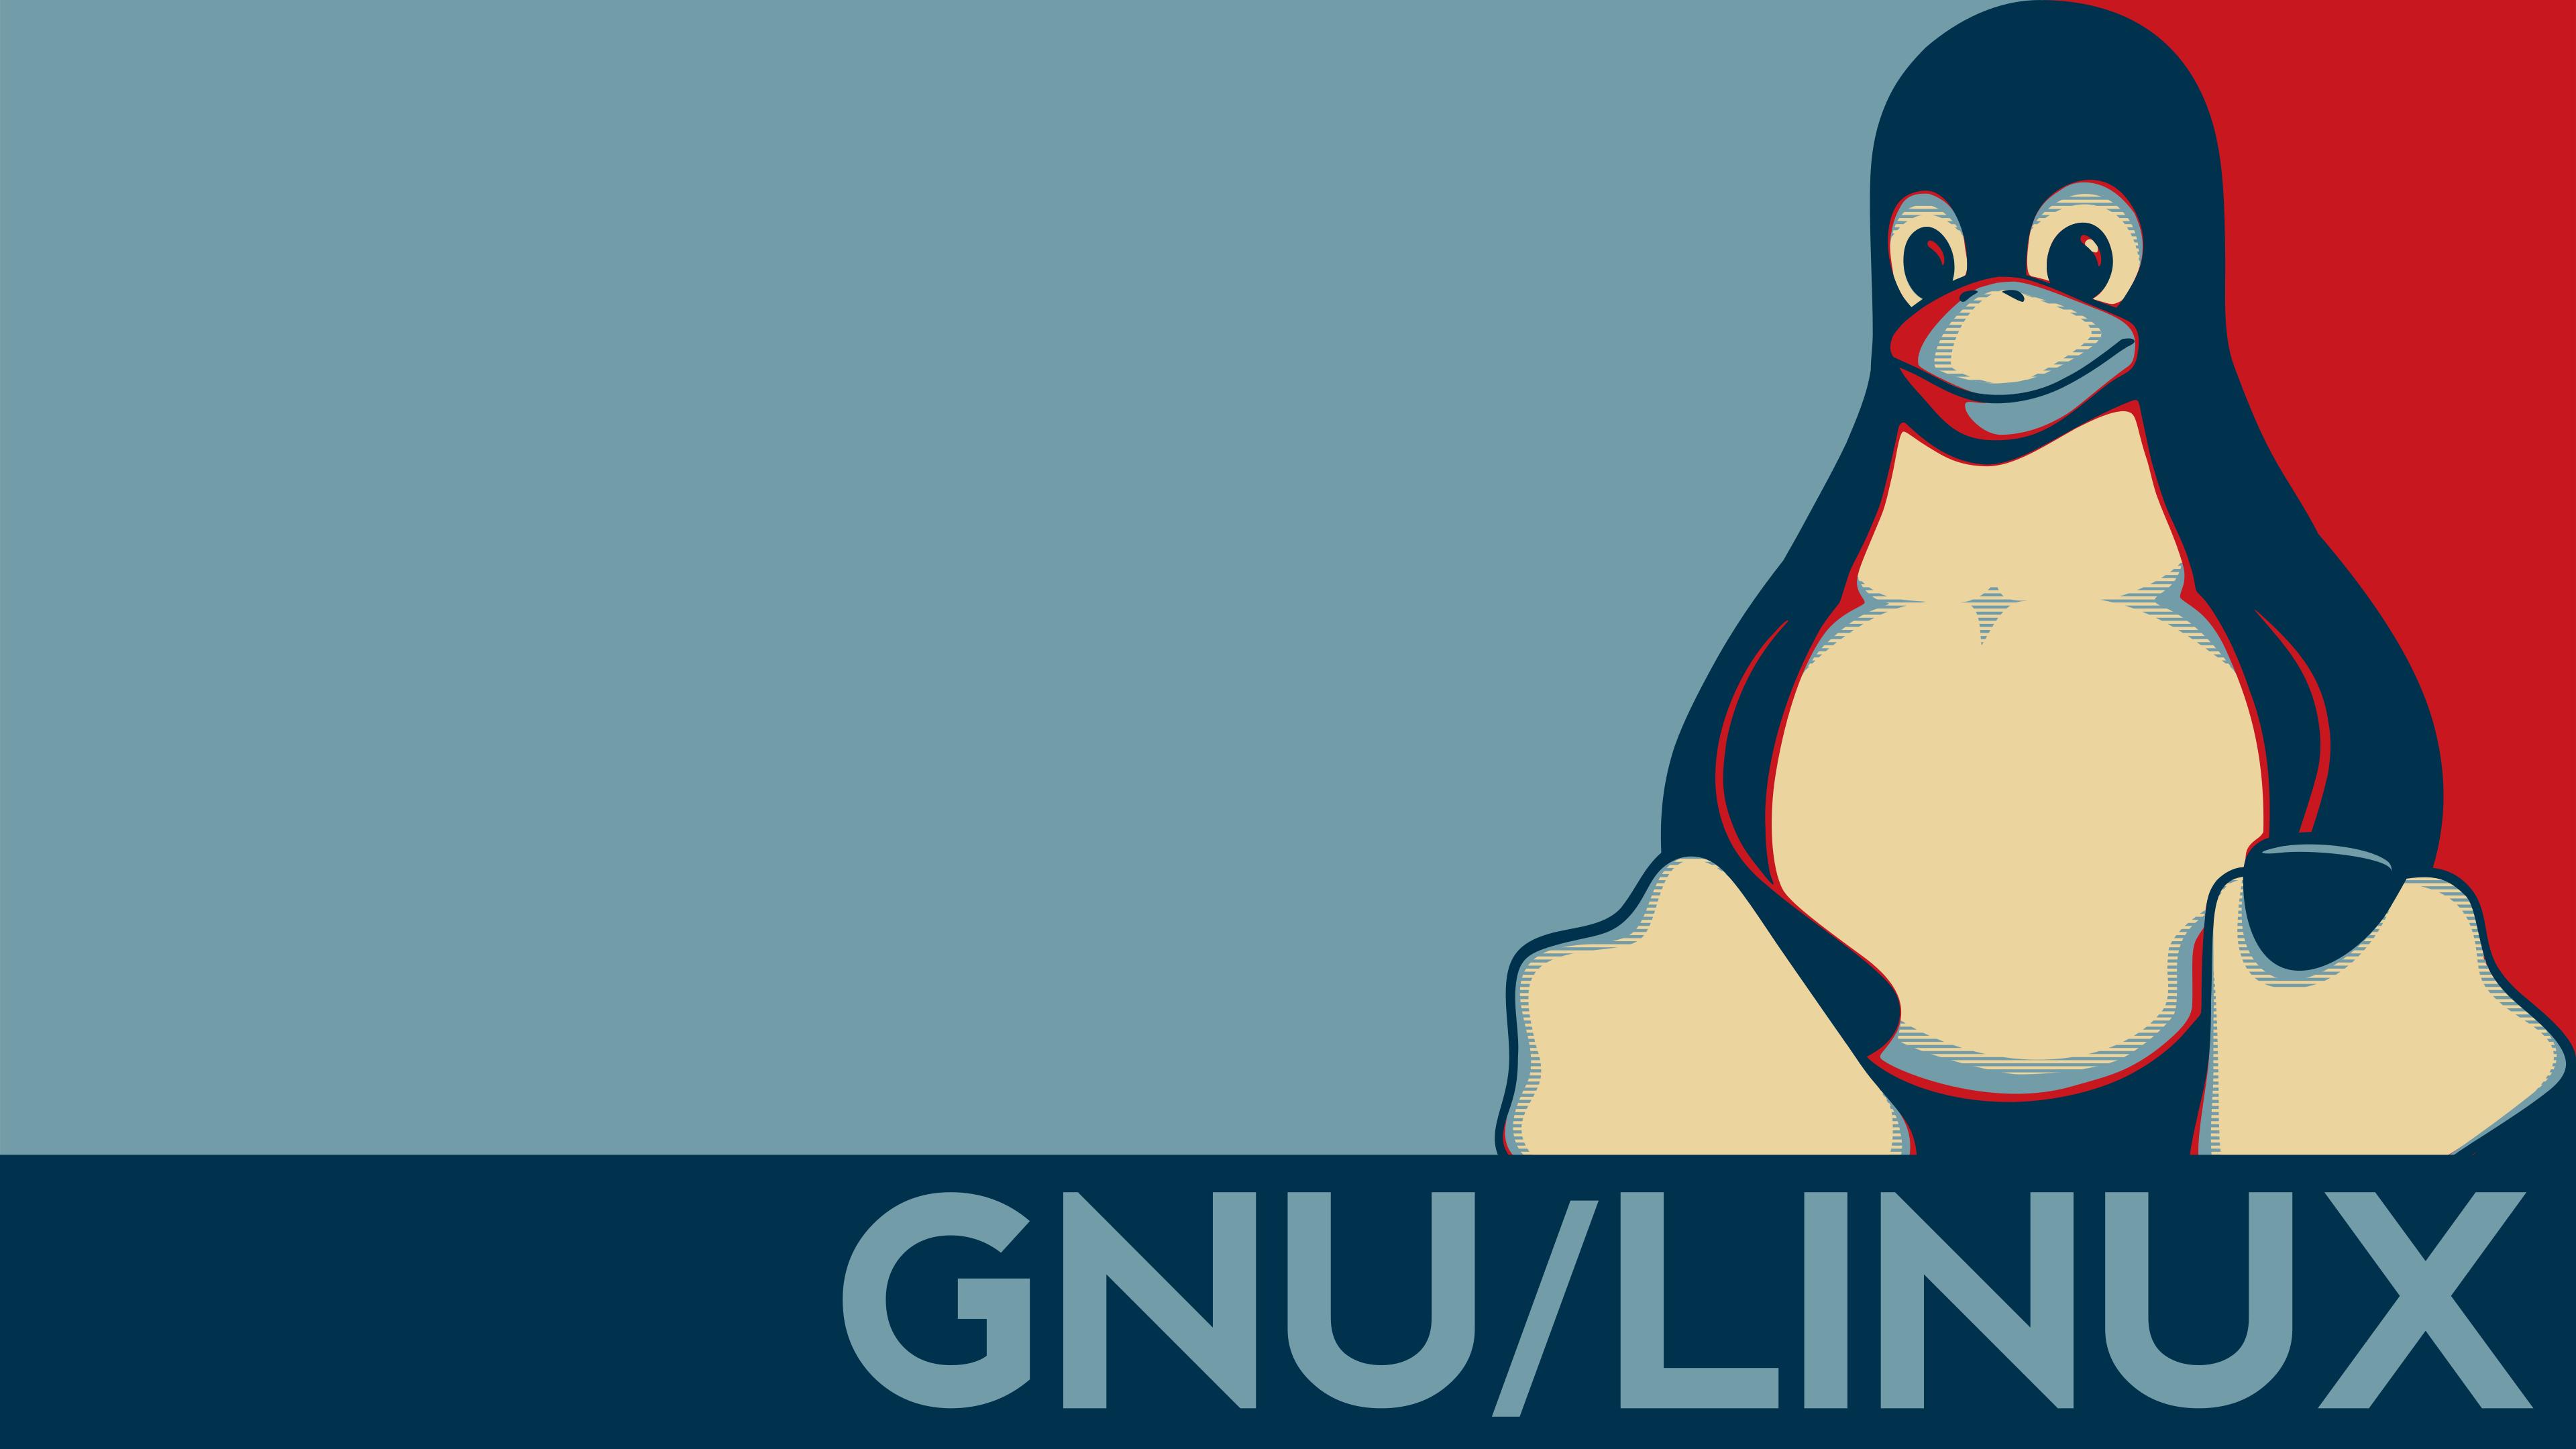 General 3840x2160 FoxyRiot hope Linux Tux